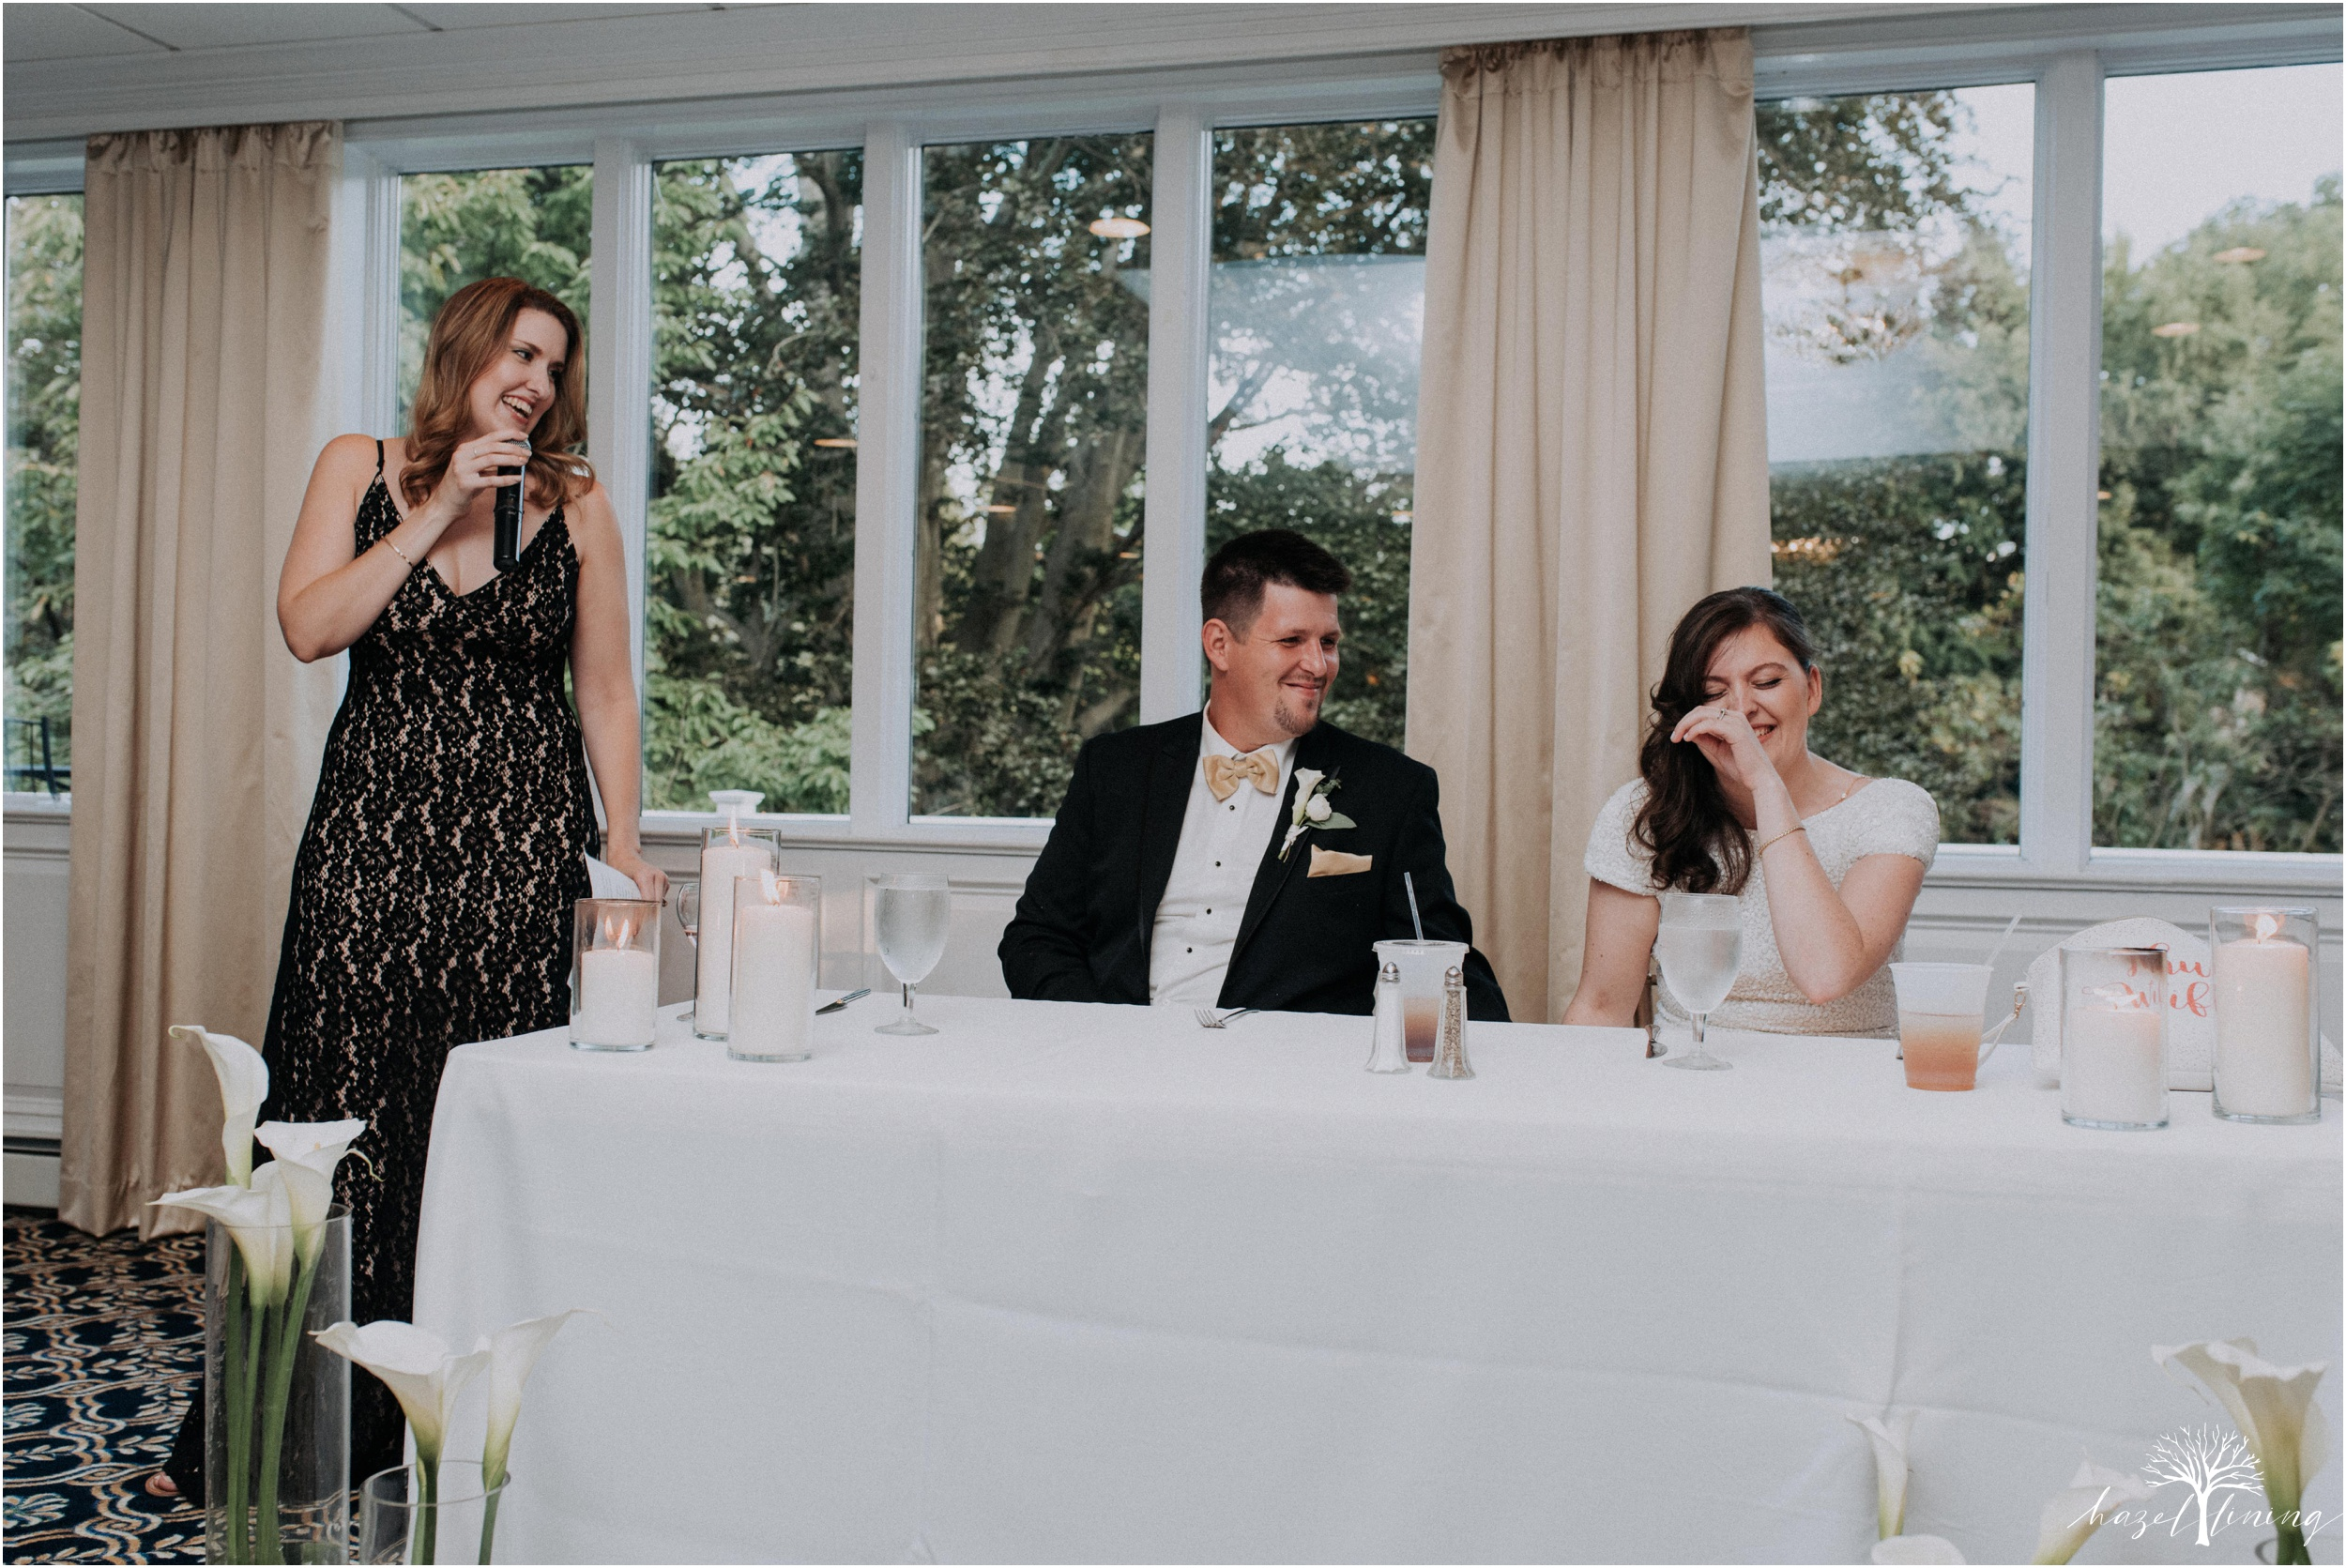 elizabeth-doelp-andrew-foreback-middletown-country-club-summer-langhorne-pennsylvania-wedding-hazel-lining-travel-wedding-elopement-photography_0142.jpg